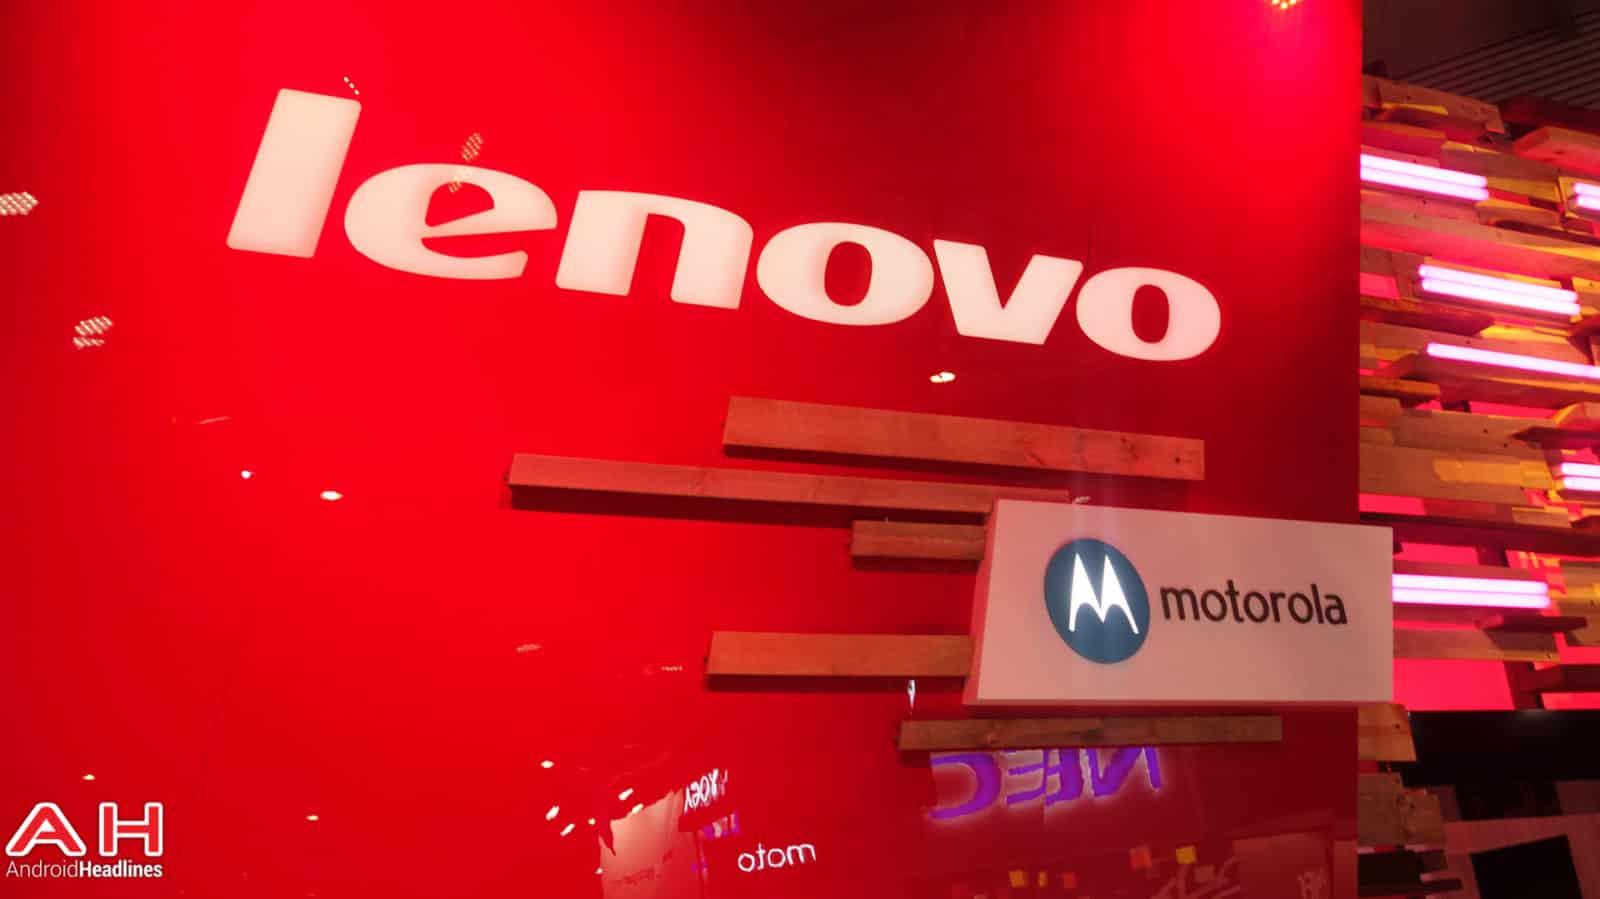 Lenovo-Motorola-Logo-AH2